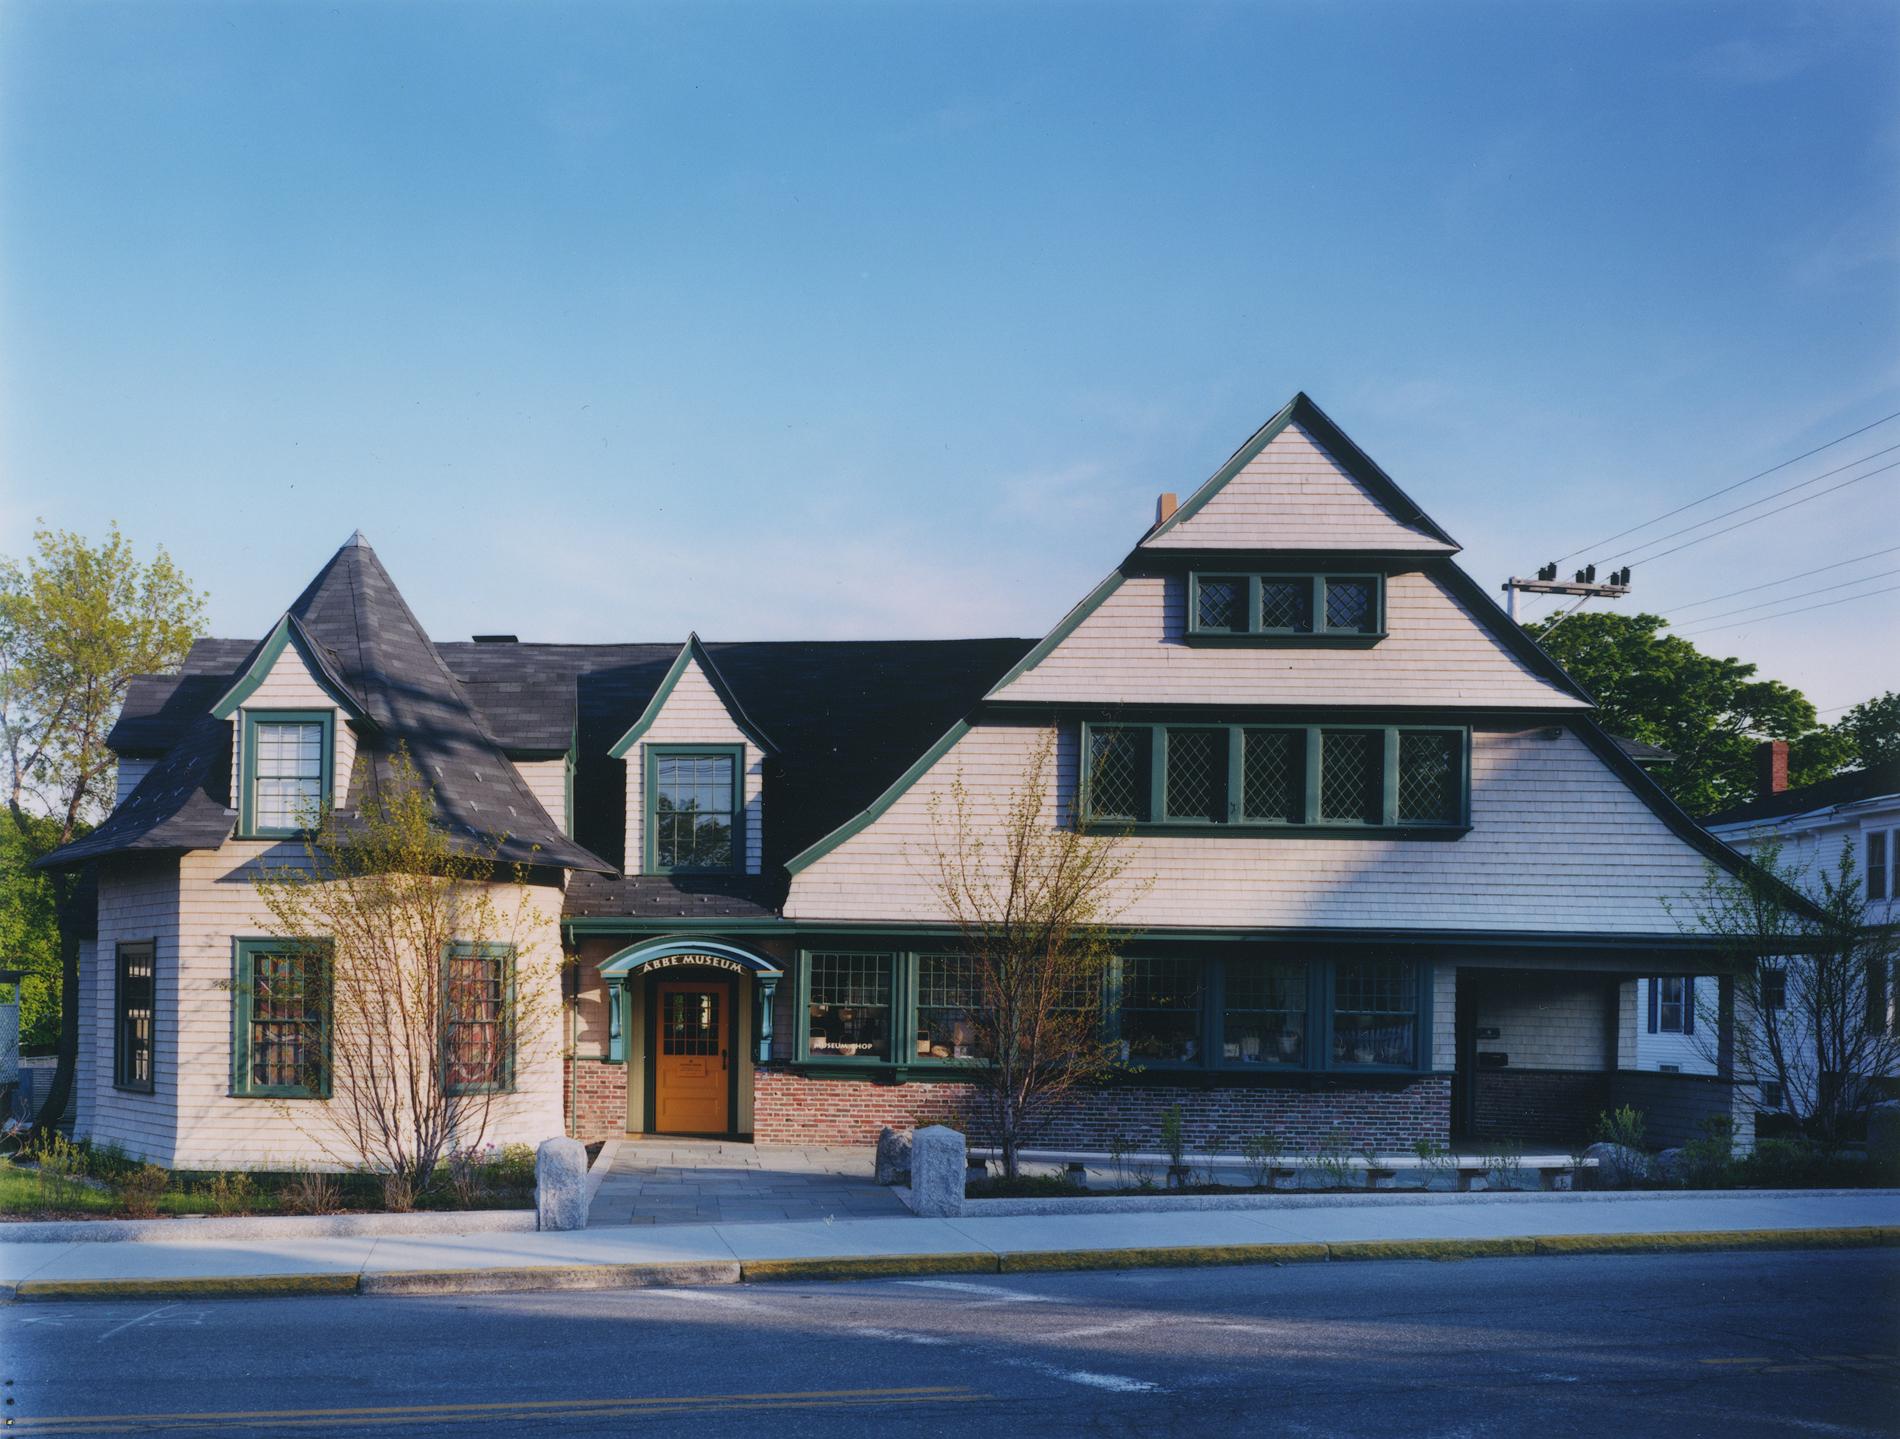 The restored shingle-style façade facing Mount Desert Street, a half block from downtown Bar Harbor's Village Green